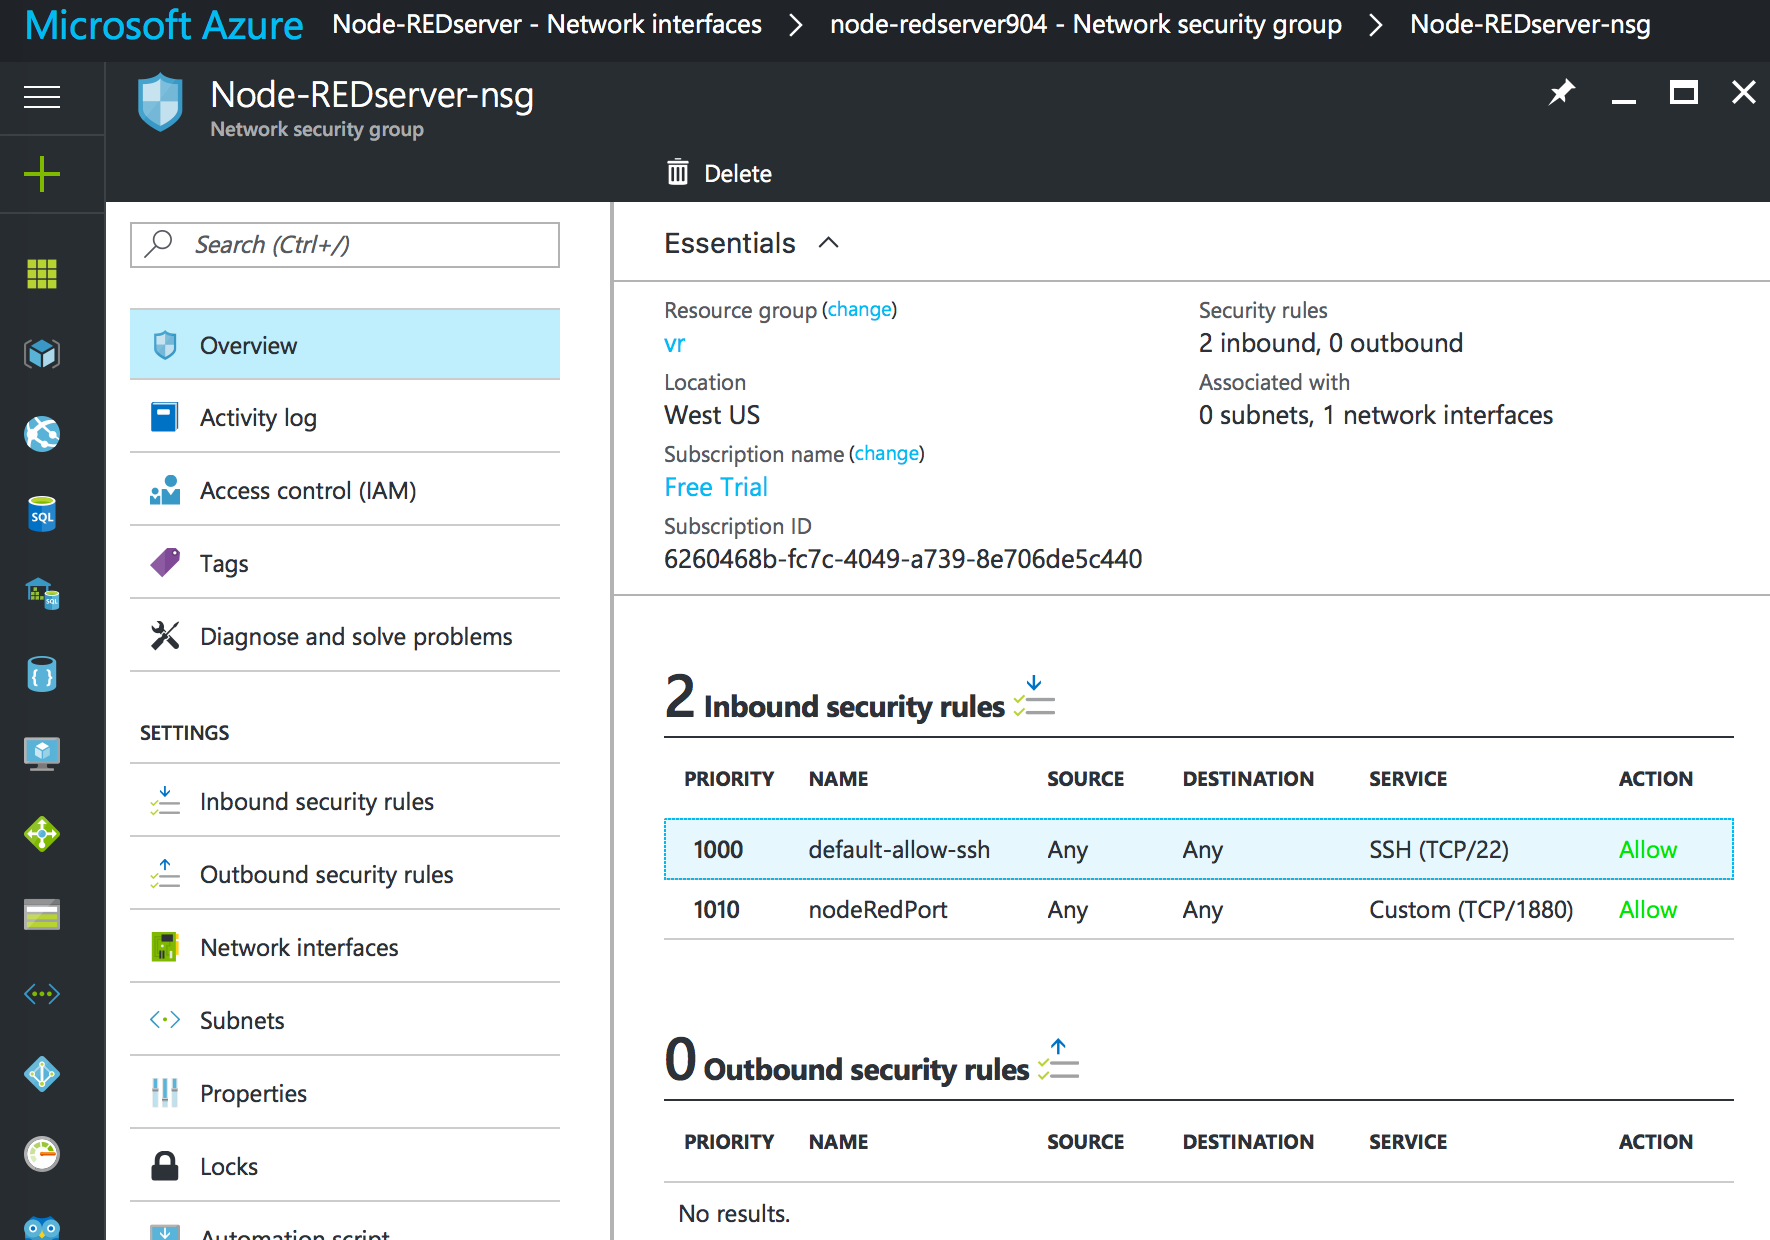 Node-RED: Running on Microsoft Azure